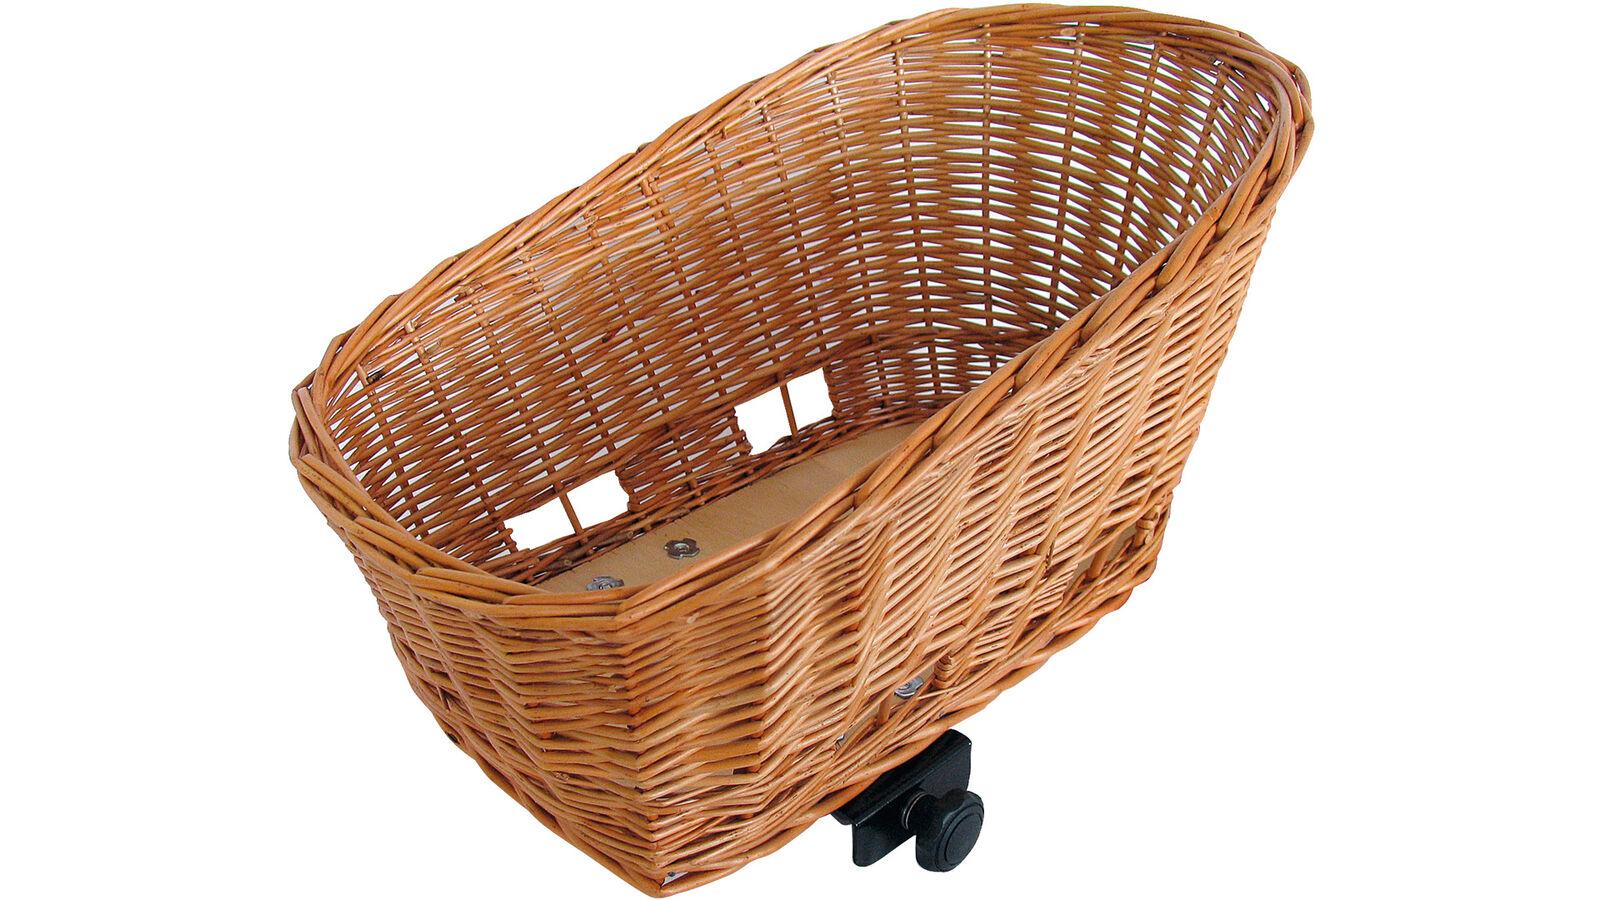 0.338.737 0 albahaca bicicleta cesta sauce mimbre trasero cesta Pasja 45 x 35 x 33